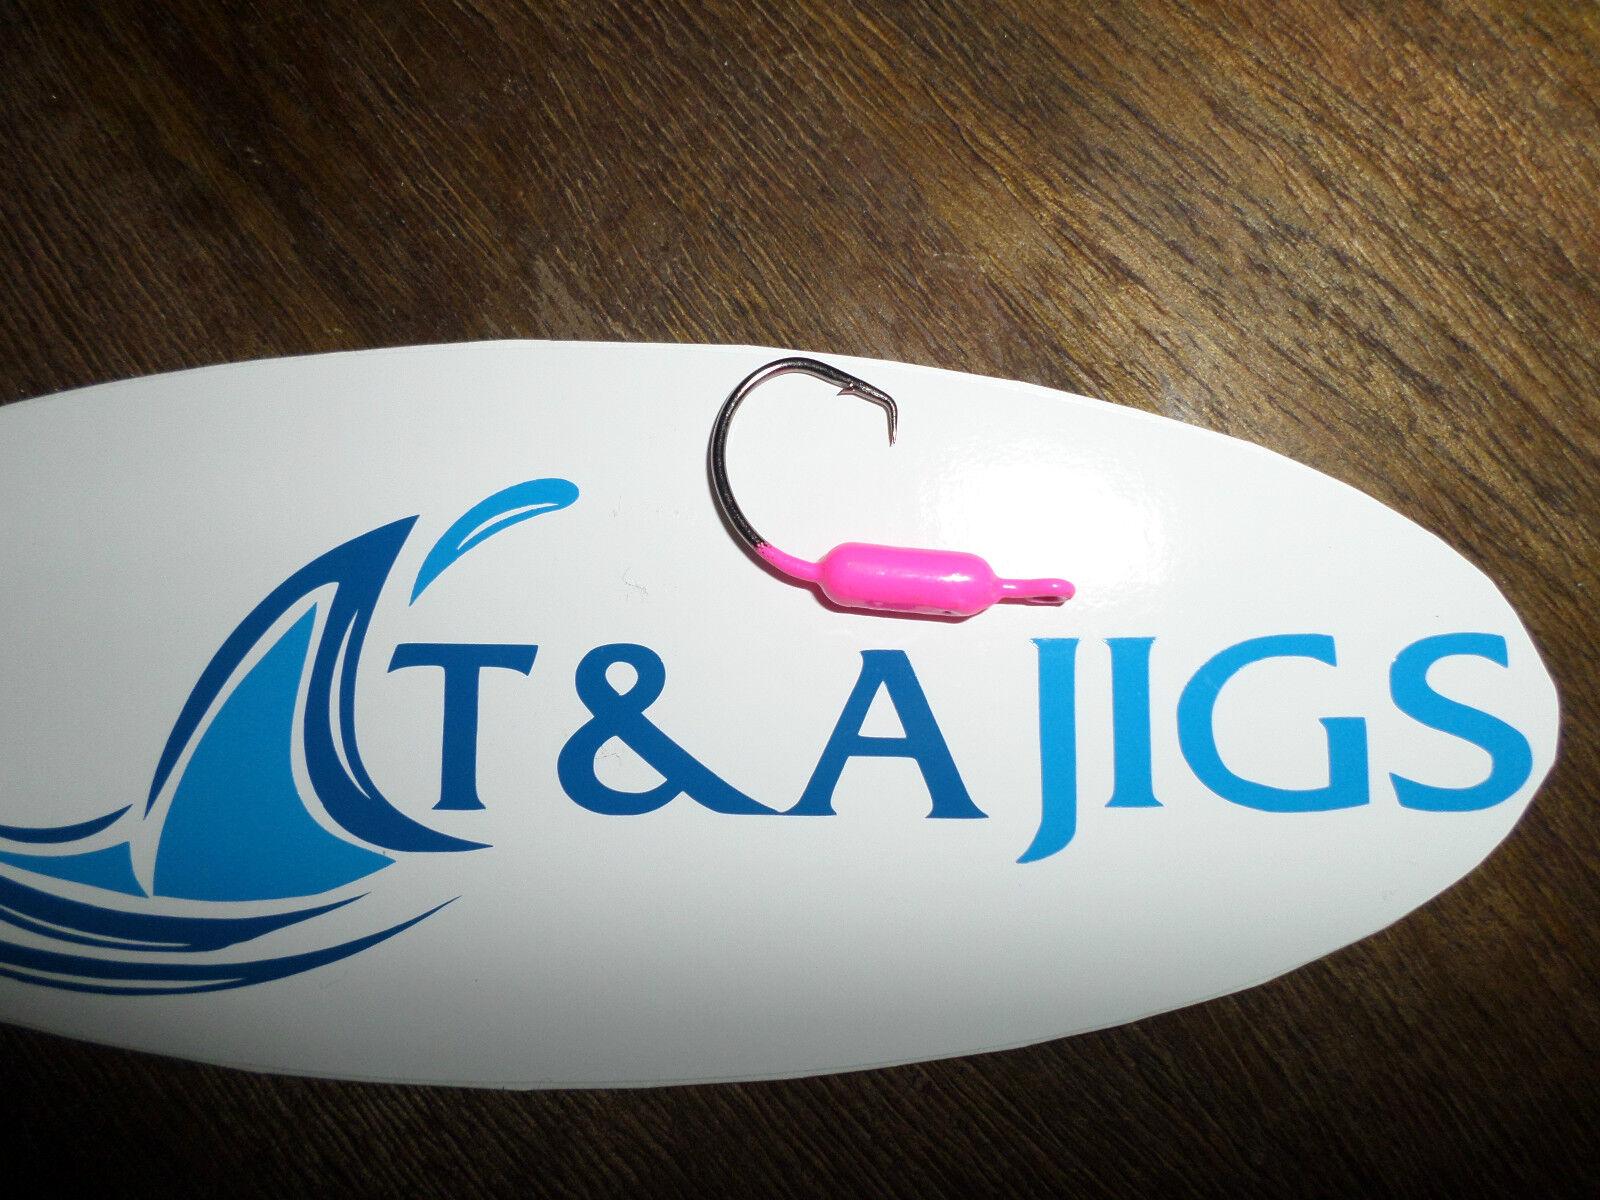 100 Gelbtail Circle Hook Jigs Größe UND Farbe CHOICE T&A JIGS Snaper Jig